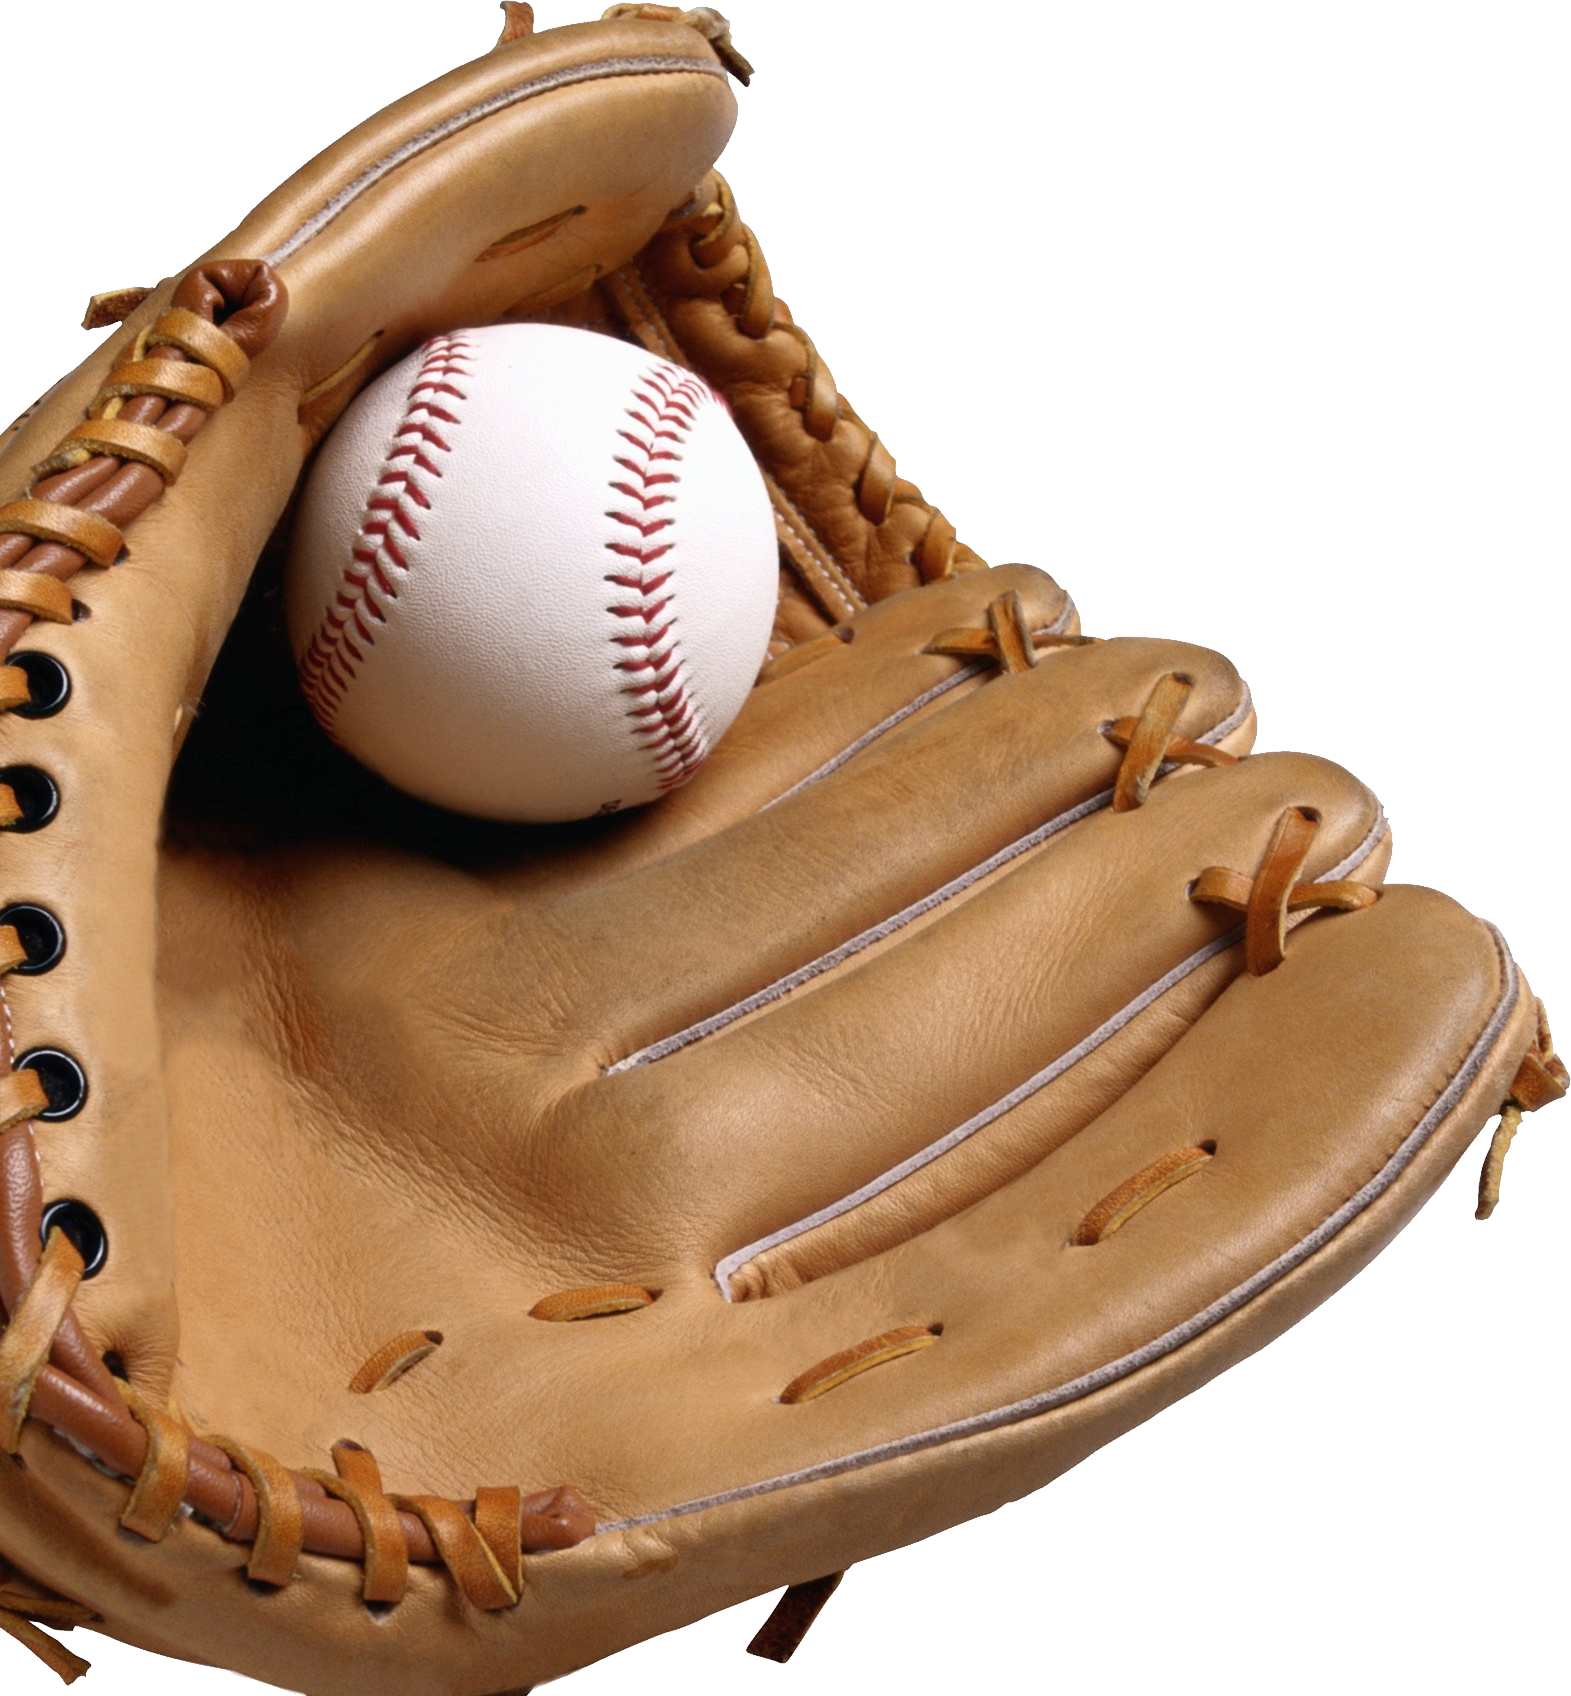 Baseball glove clipart free jpg transparent library Baseball Gloves PNG Image - PurePNG | Free transparent CC0 PNG Image ... jpg transparent library